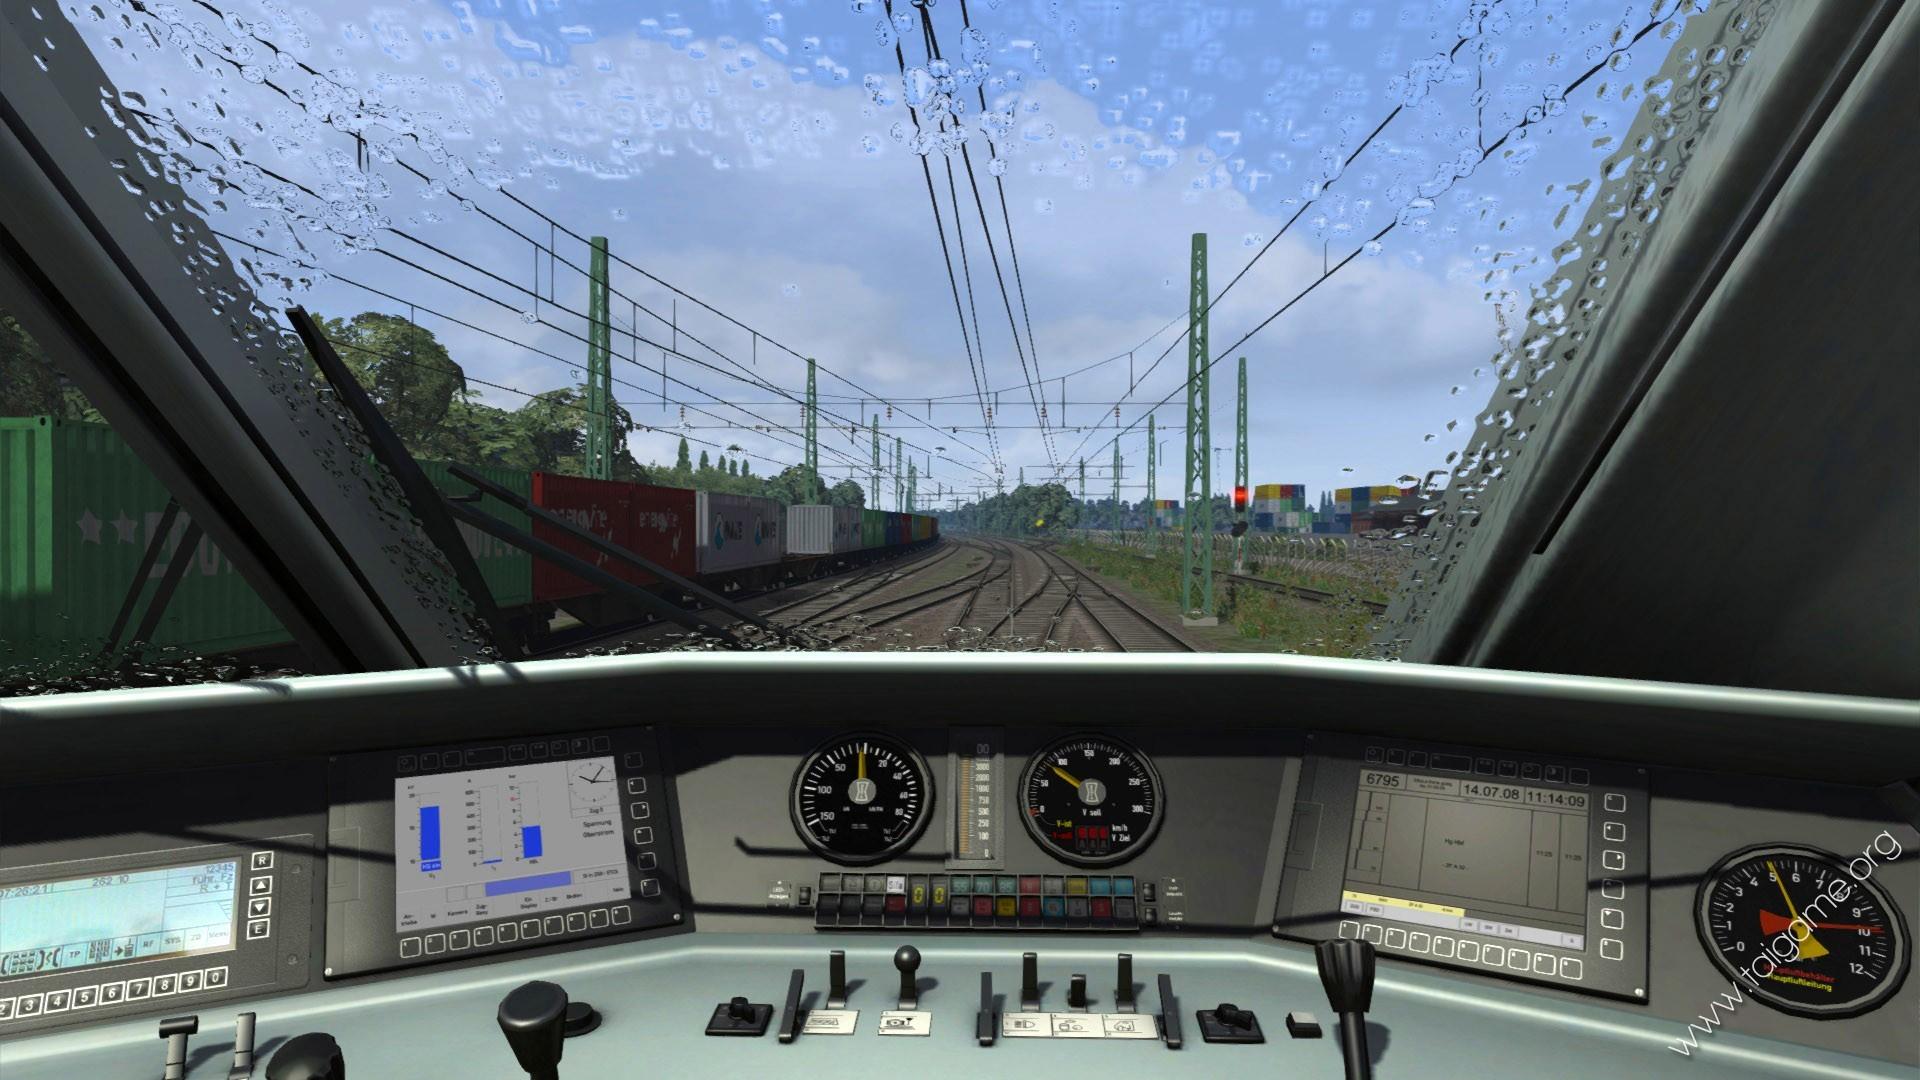 Train Simulator 2018 Overview